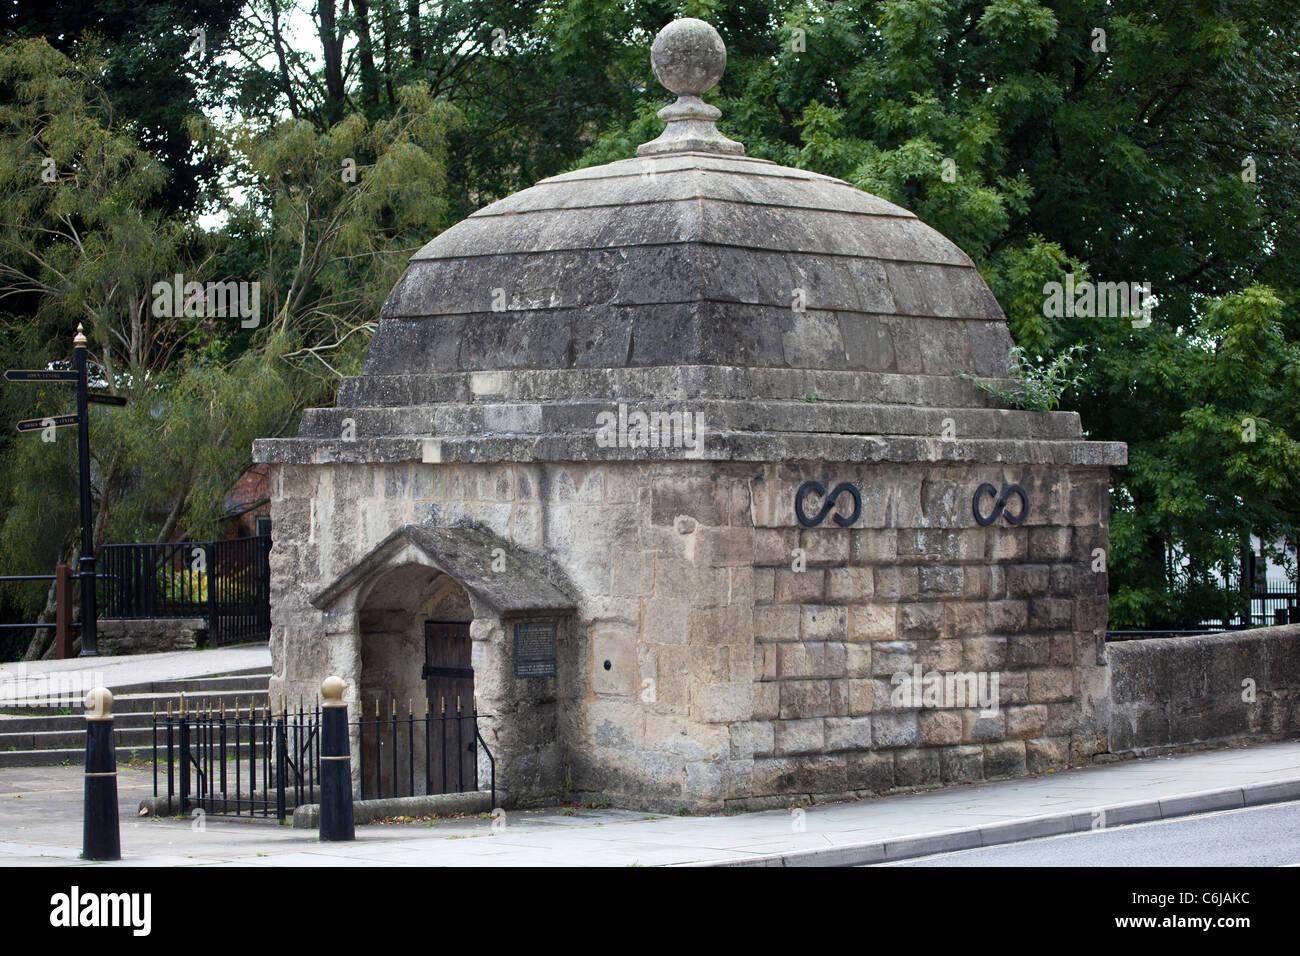 The Old Lock Up Gaol Trowbridge Wiltshire - Stock Image